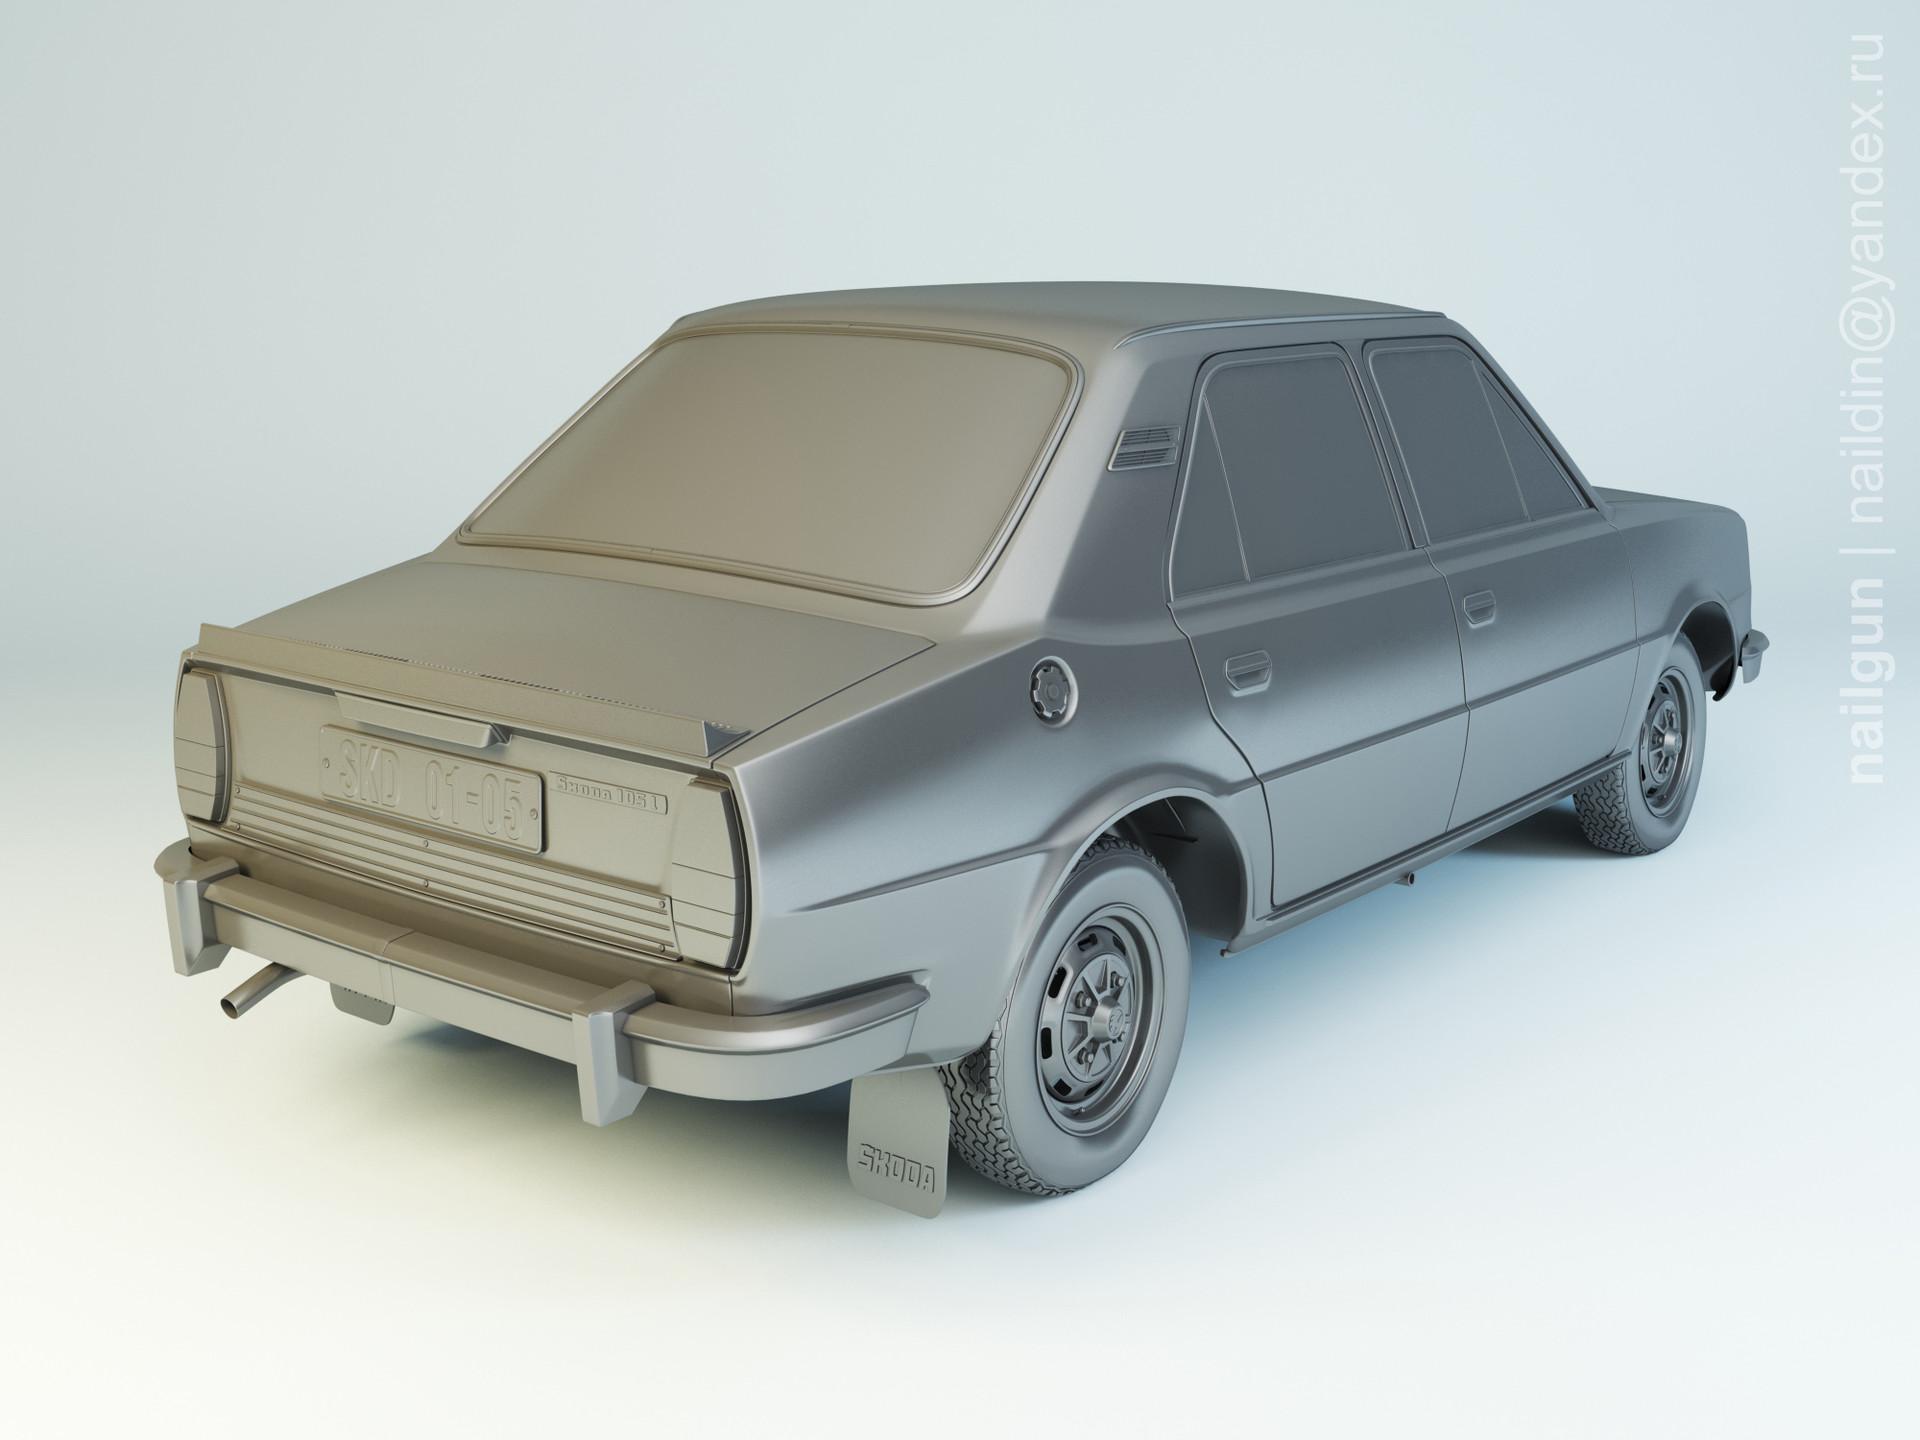 Nail khusnutdinov als 195 002 skoda 105 1980 modelling 1